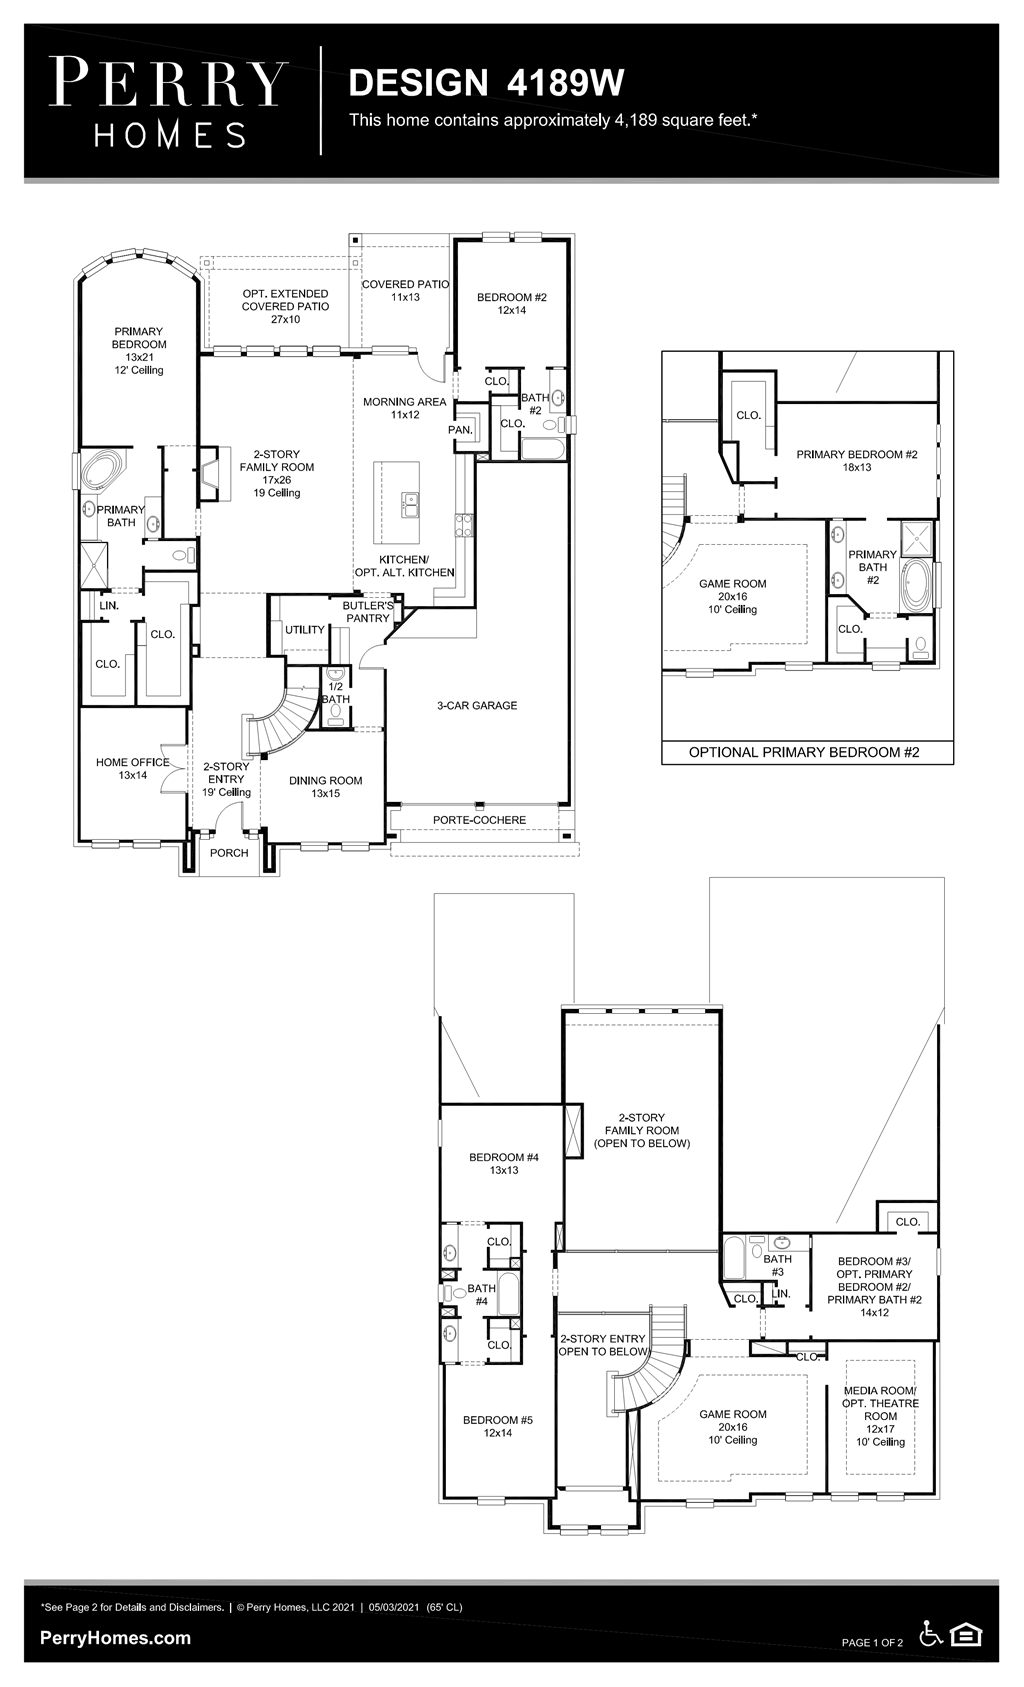 Floor Plan for 4189W